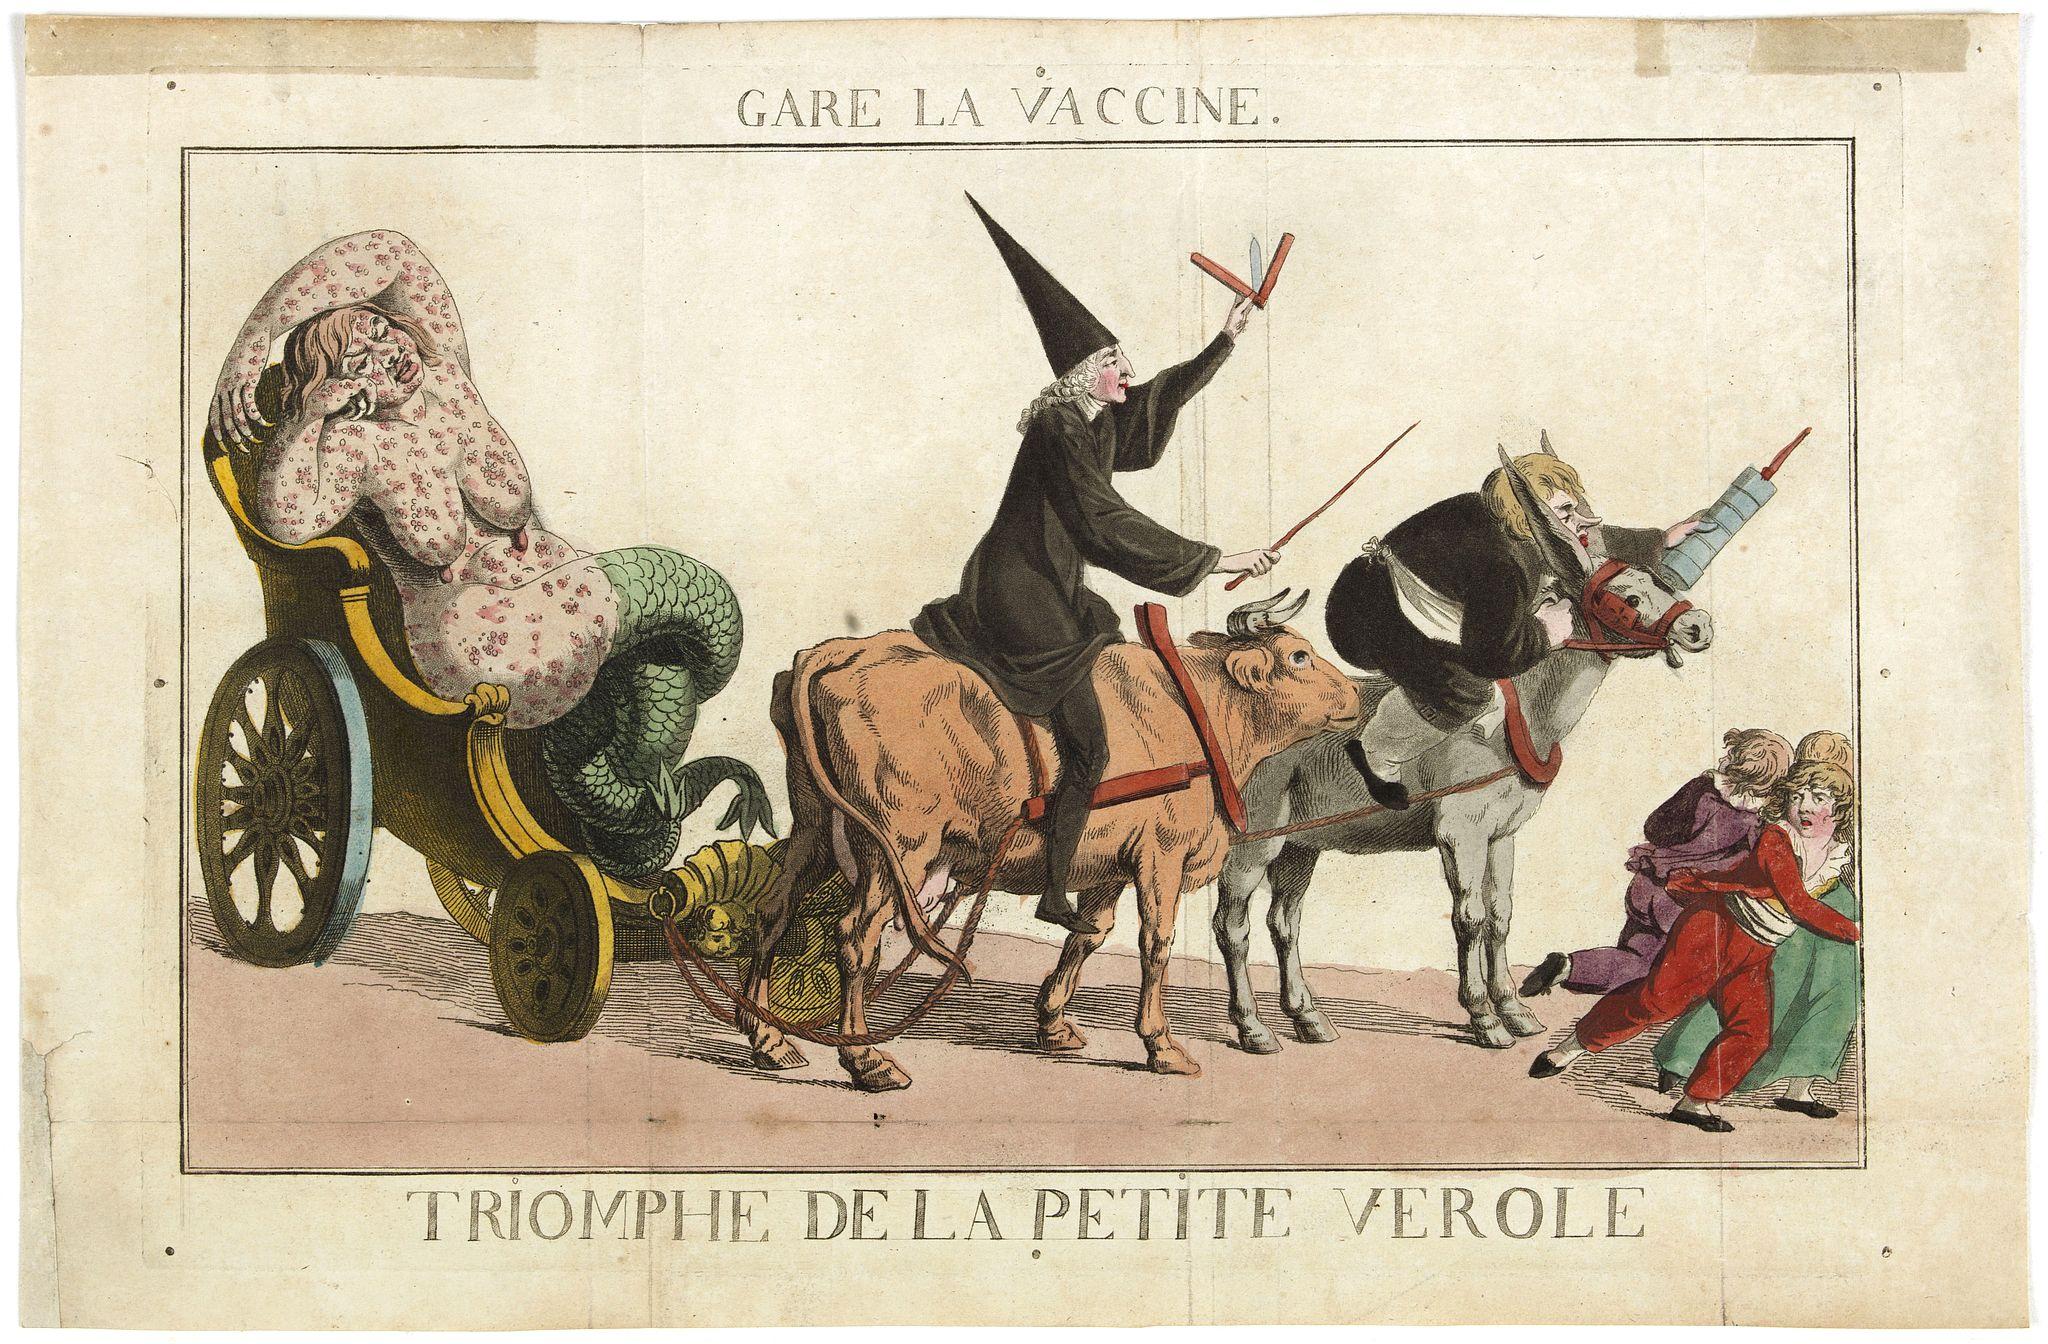 BARGES, Argaud de. -  Gare la Vaccine - Triomphe de la petite Vérole.